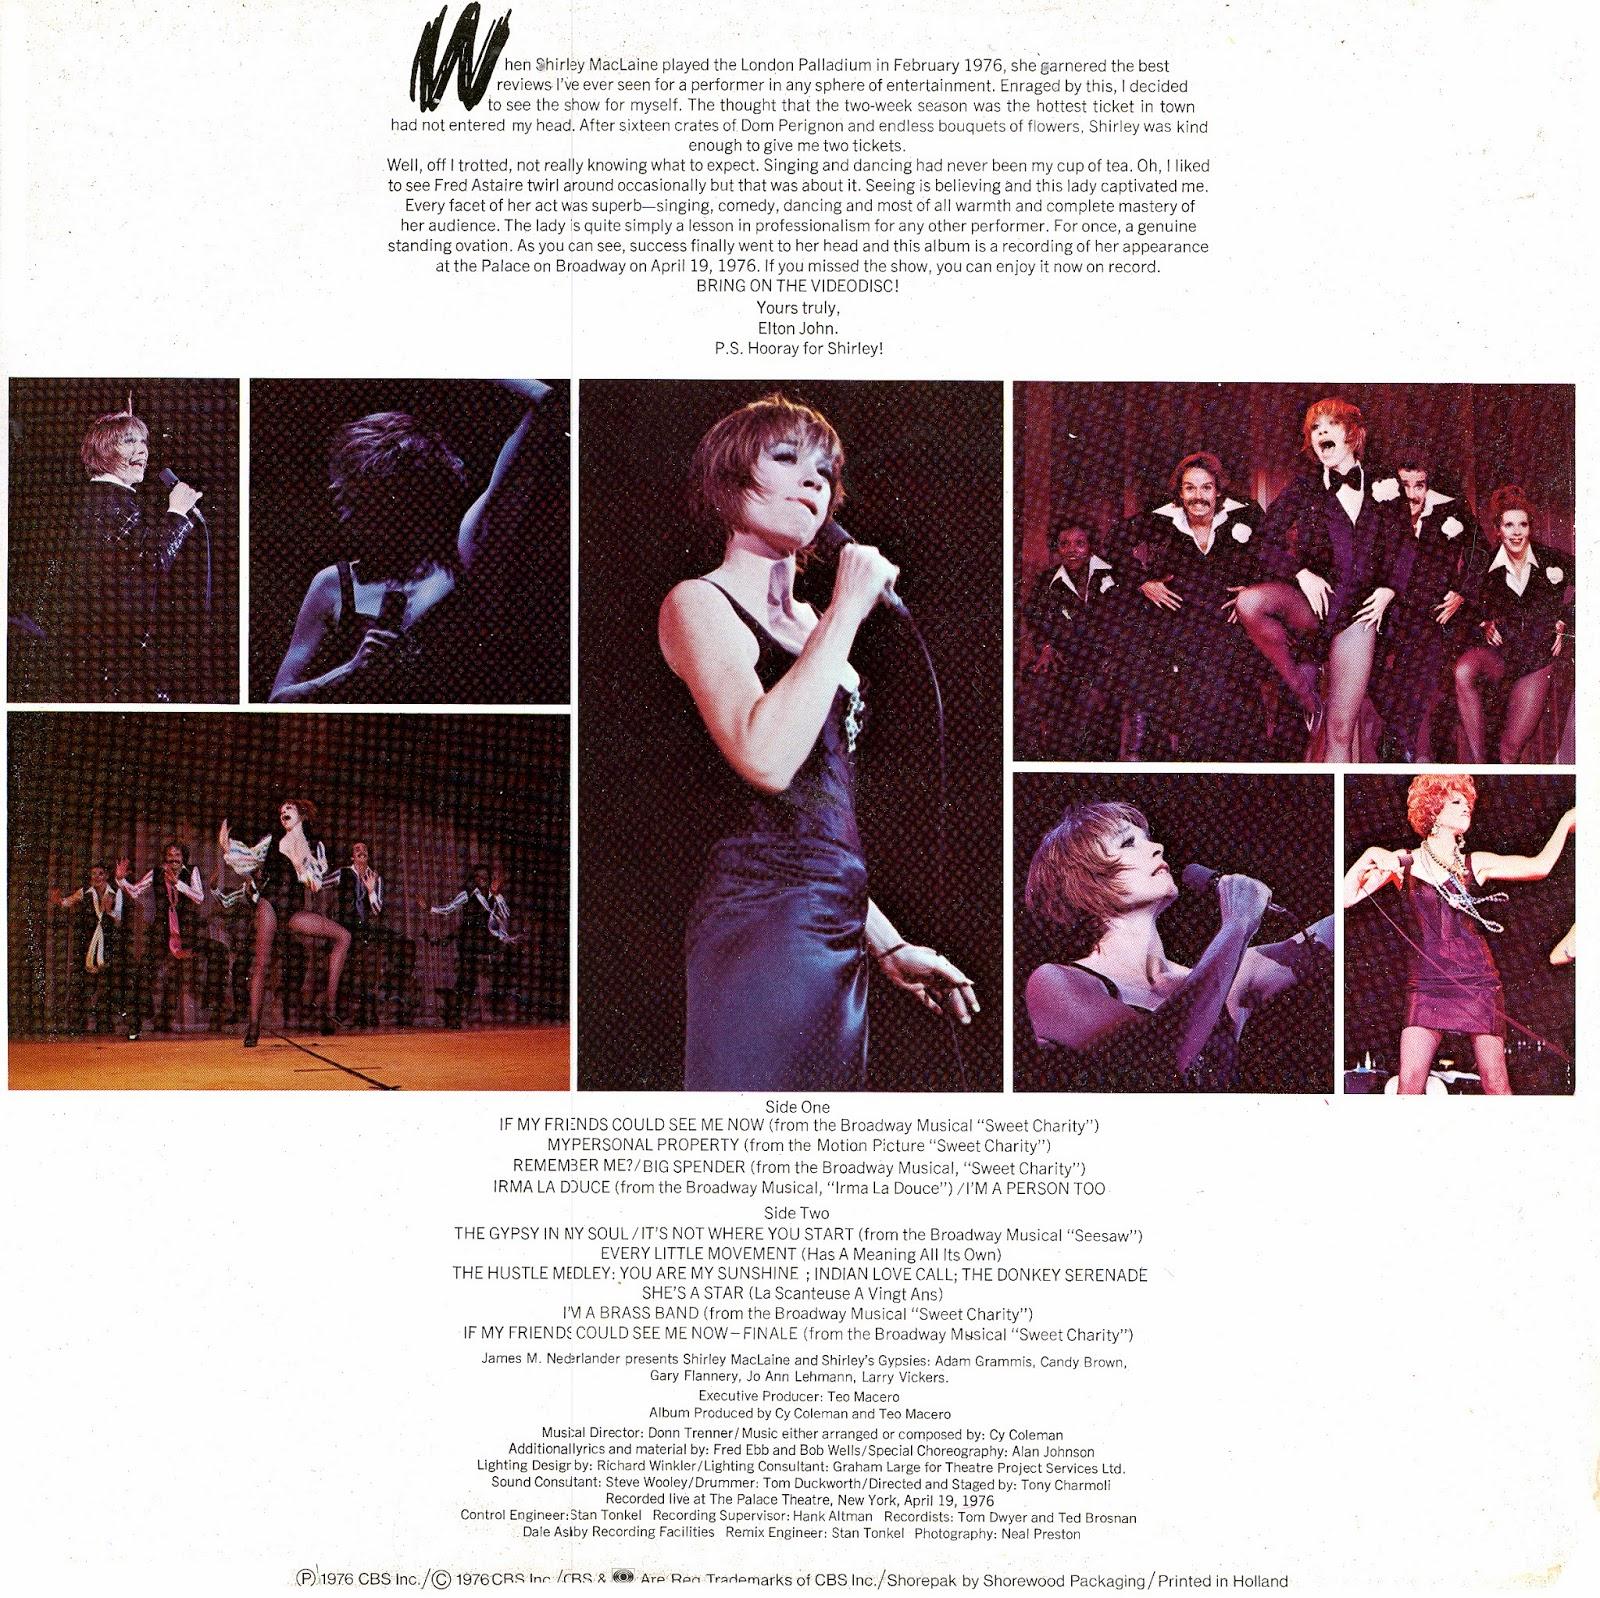 Shirley Maclaine The Apartment: Luigi's 50's & 60's Vinyl Corner: Shirley MacLaine.320 Kbps